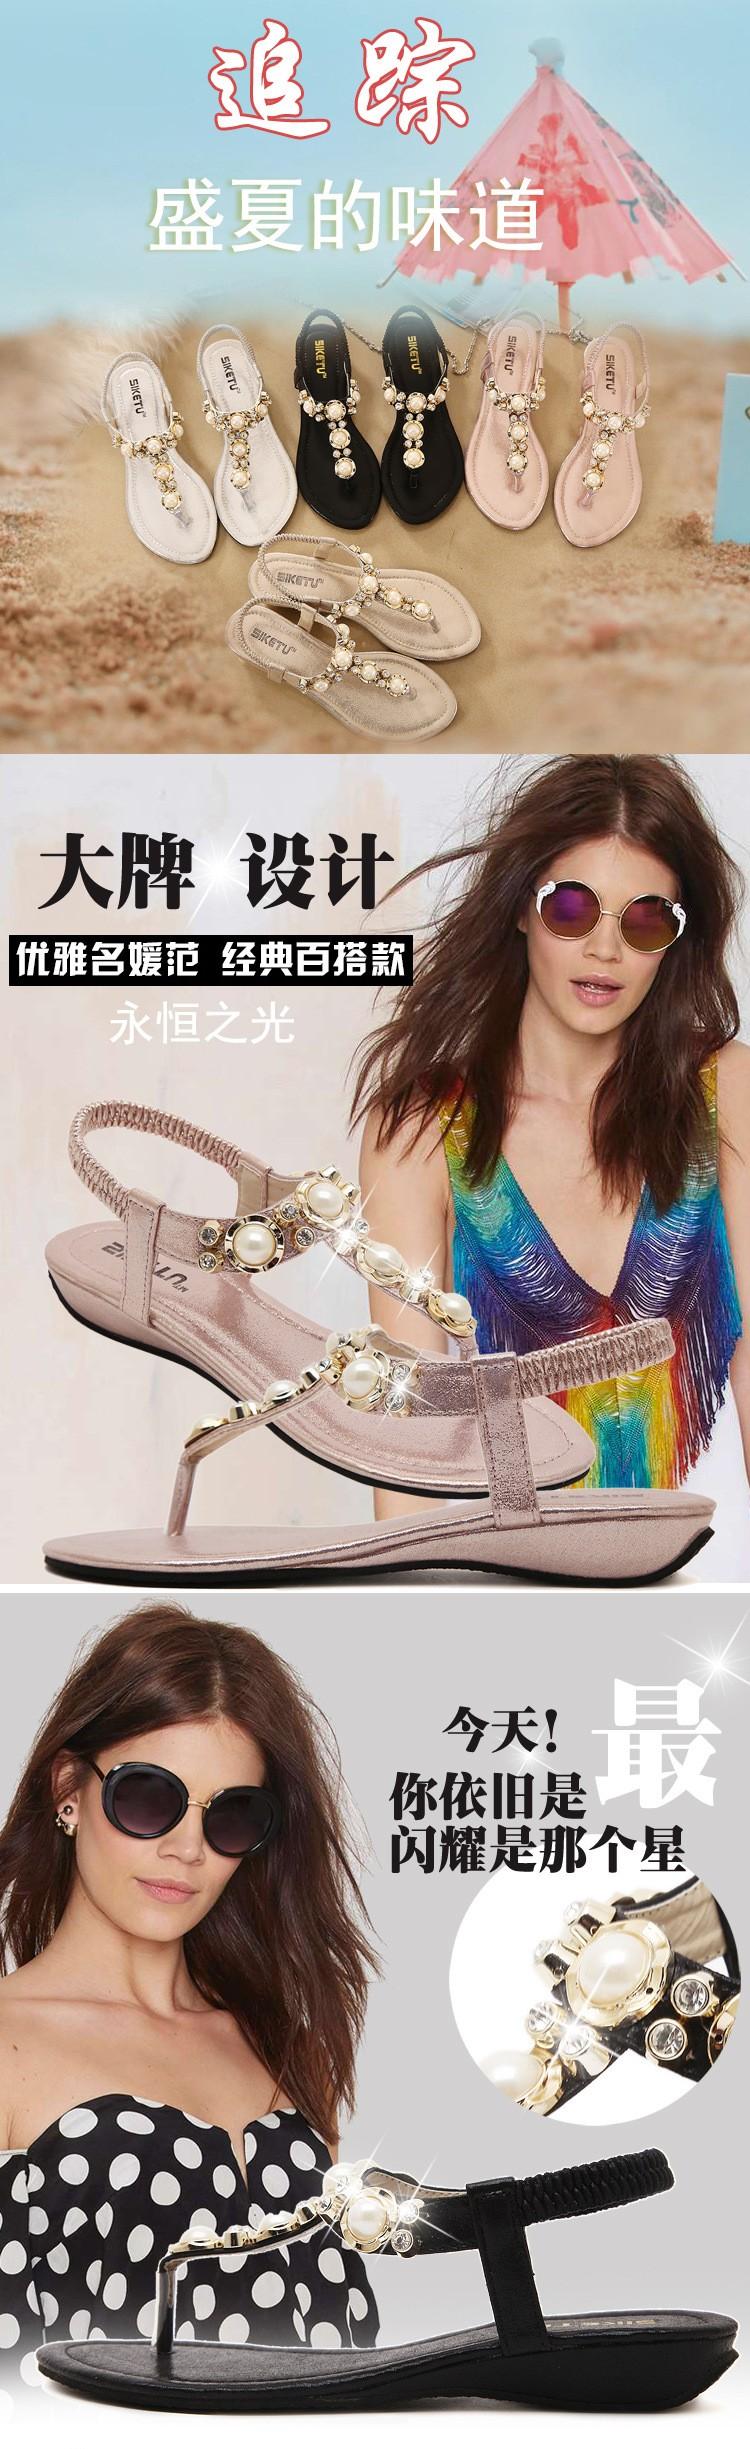 2016 Korean Flat Rhinestone Sandals Women Flip Flop String Bead Casual Summer Shoes Sandalias Tacon Mujer Beach Shoes NX84